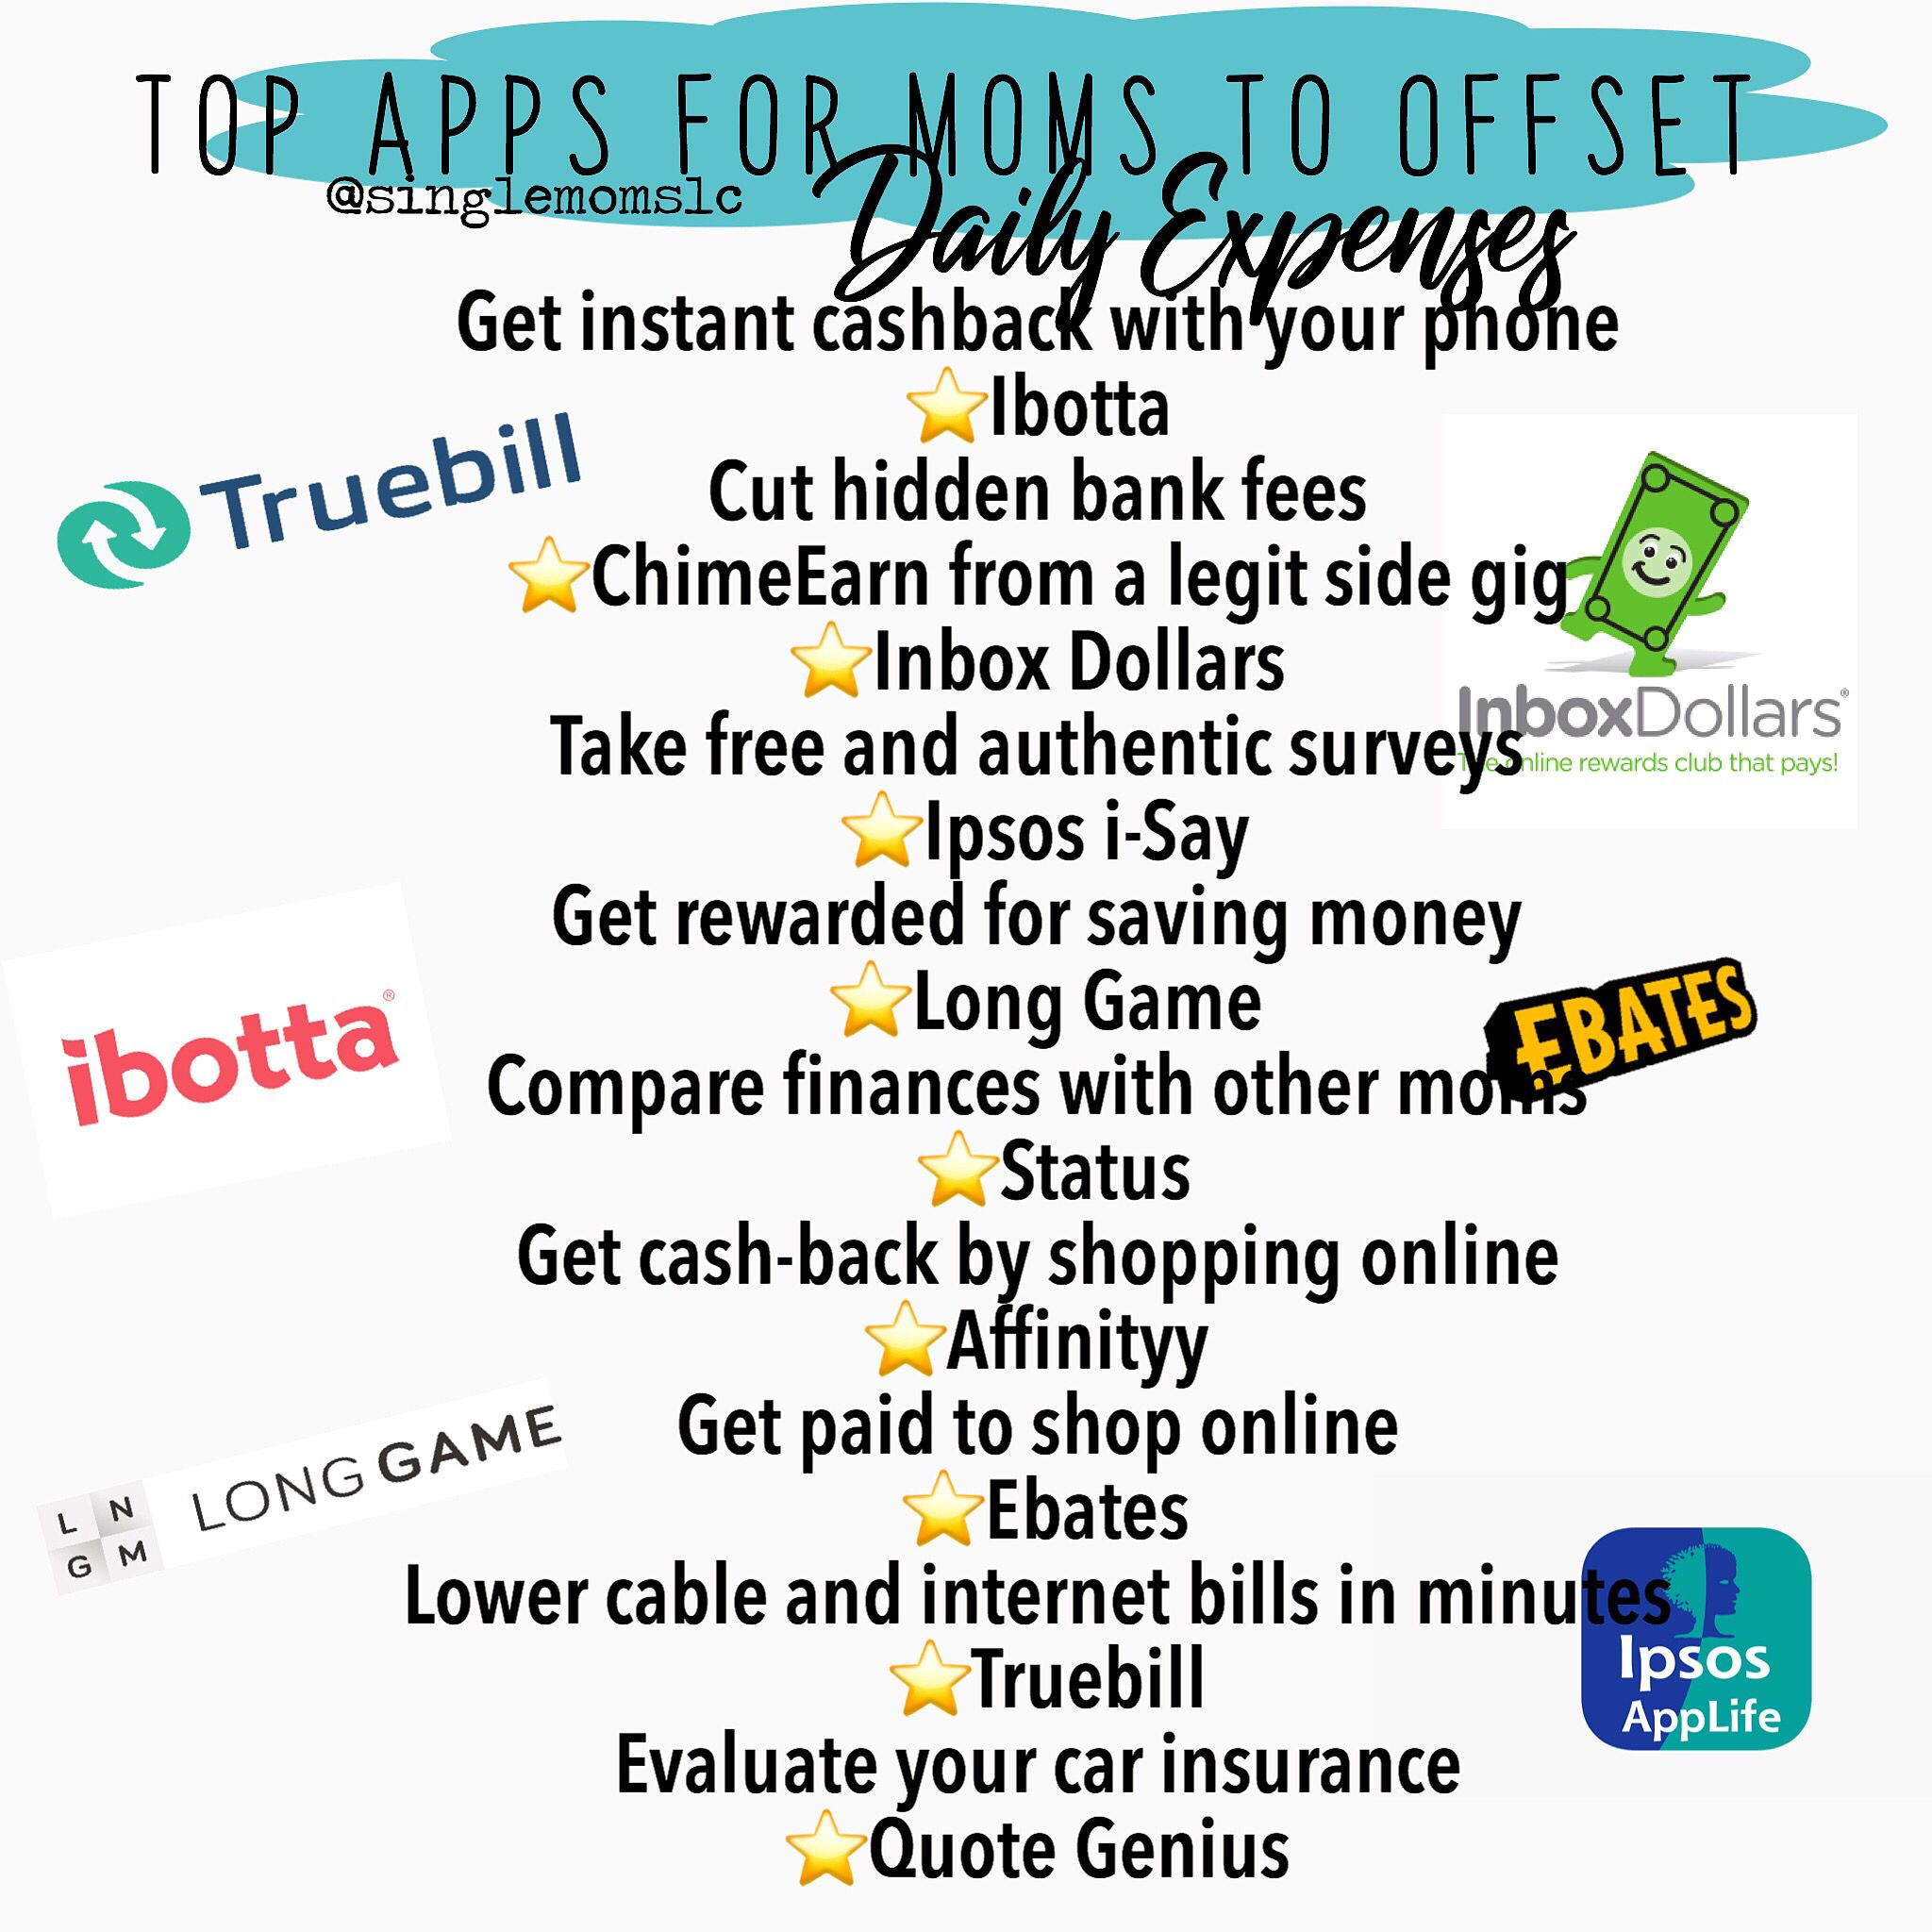 budgeting moneymanagement tips moms Apps for moms